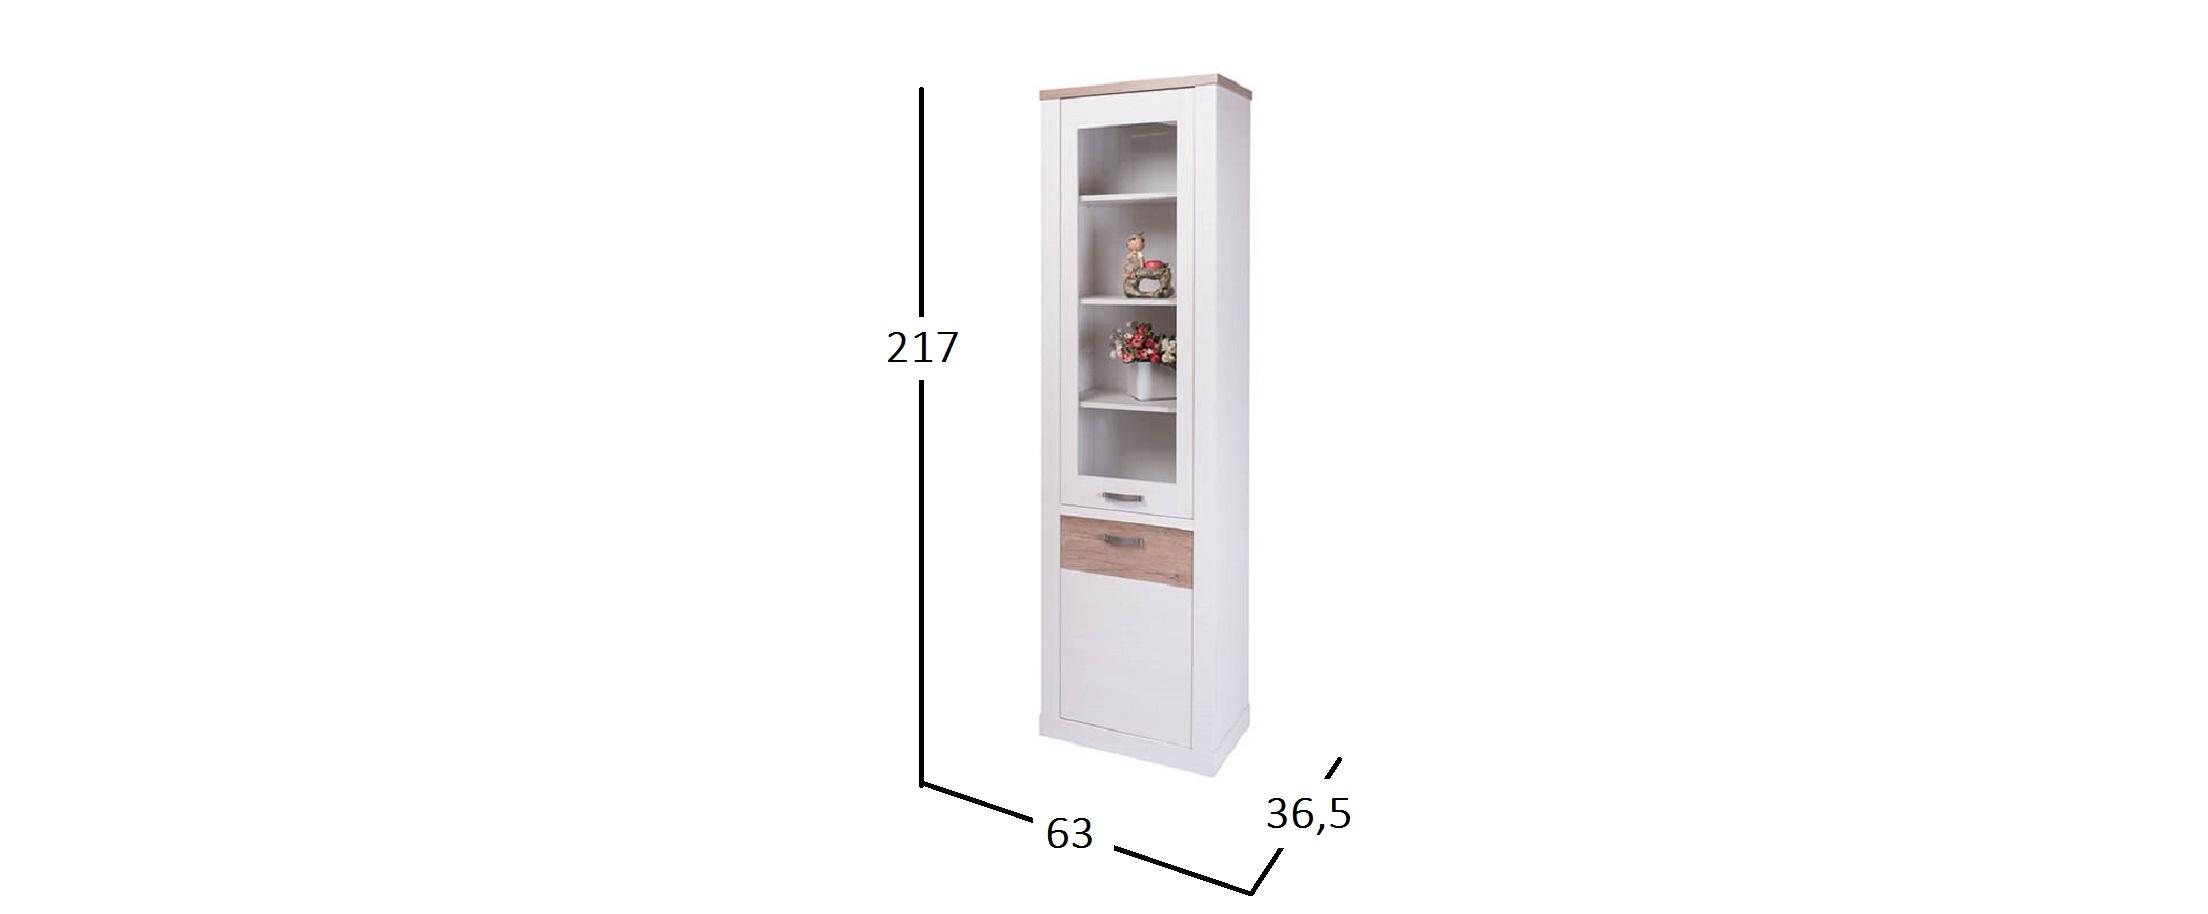 Шкаф-пенал Прованс Модель 733